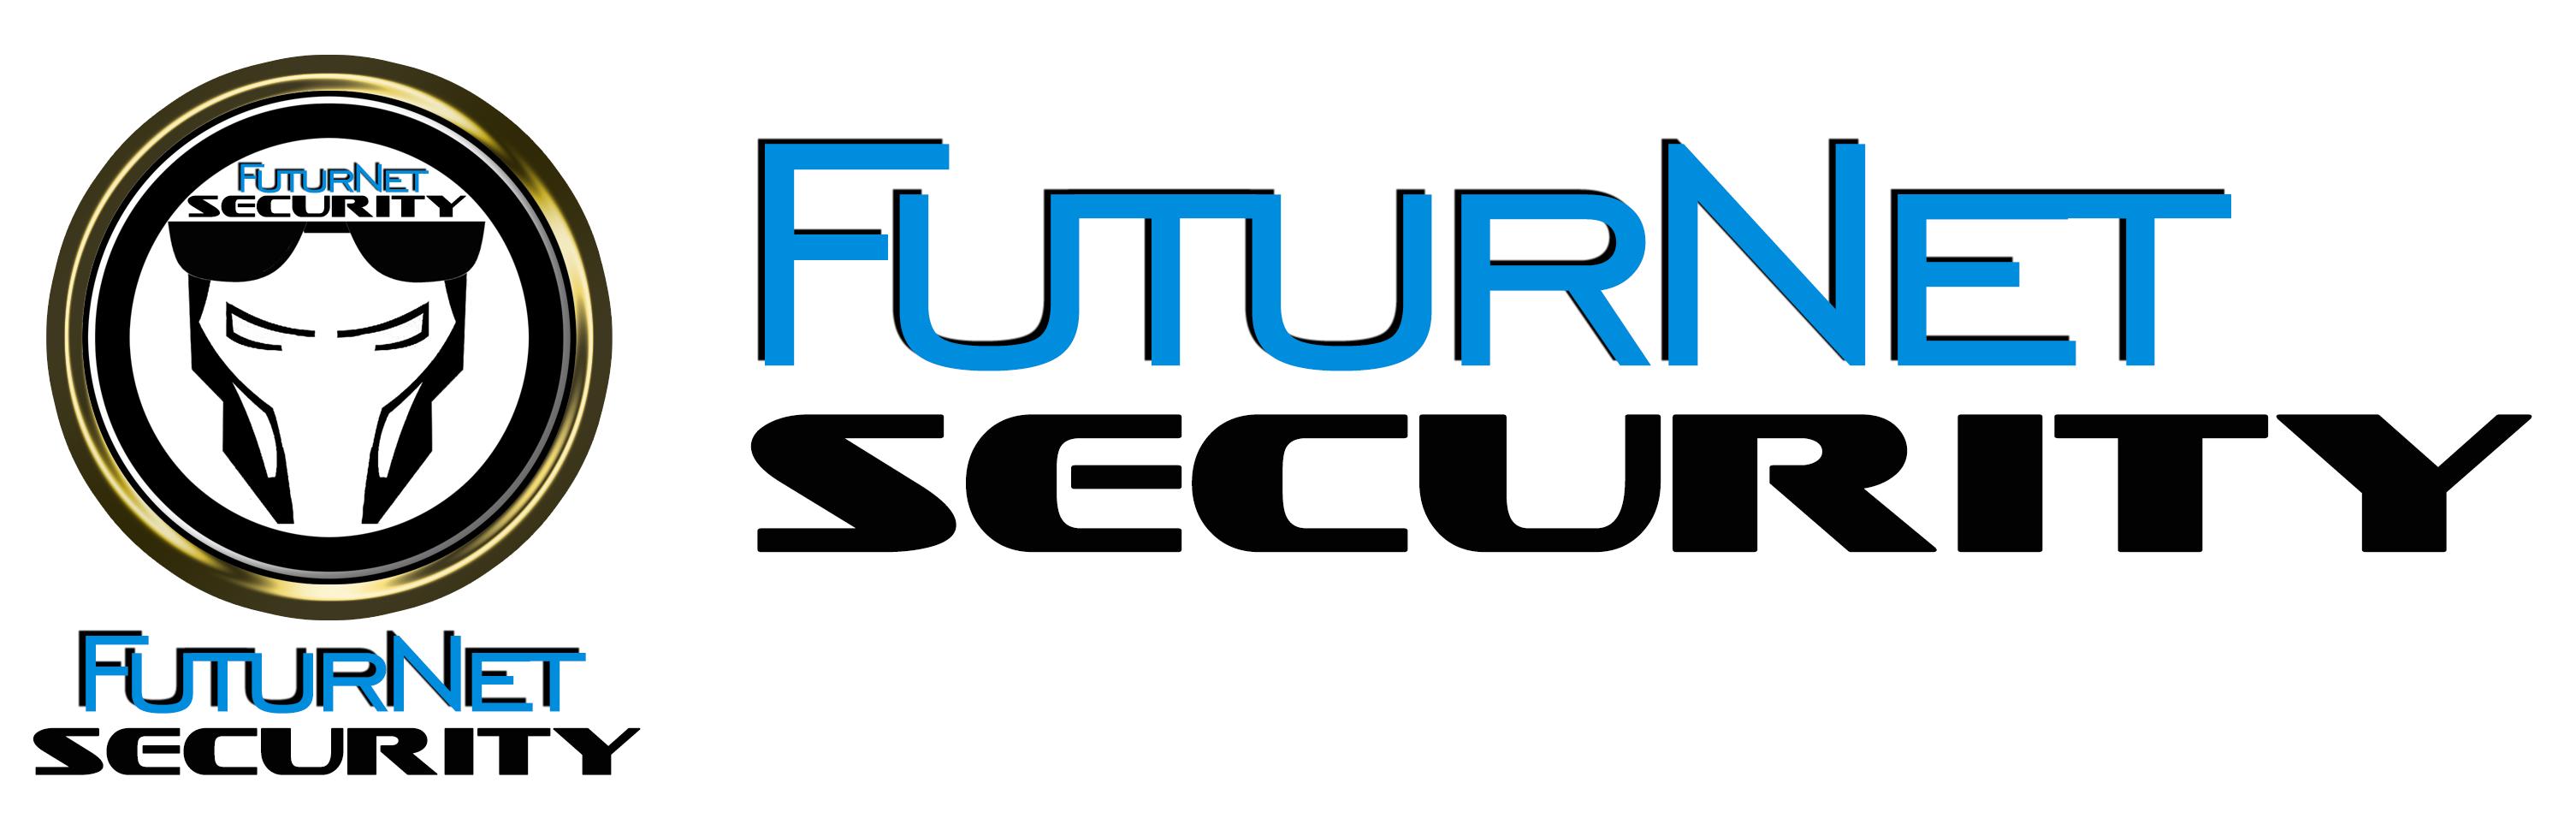 Futurnet Security